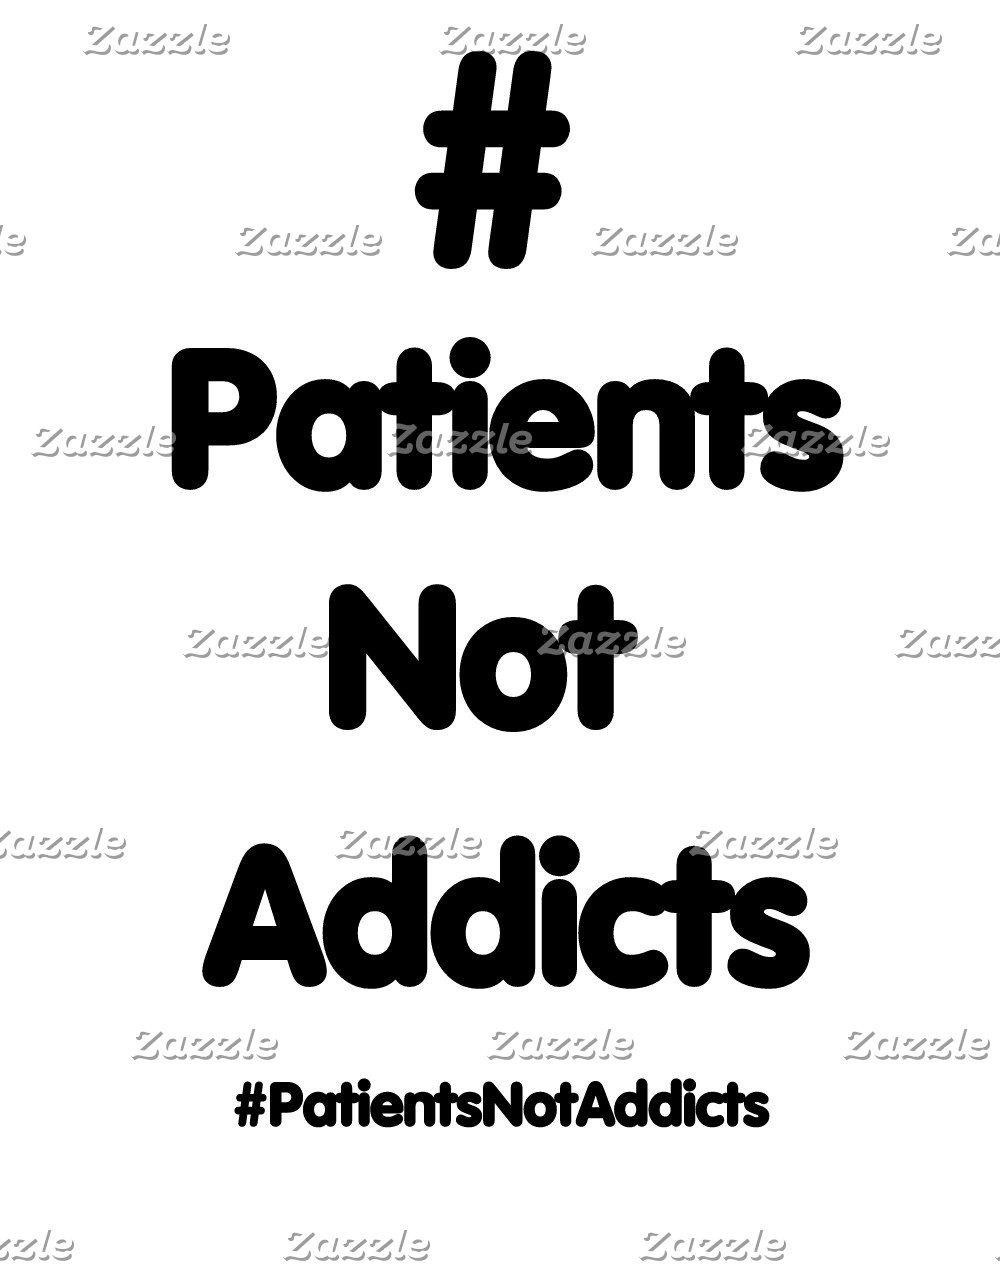 #PatientsNotAddicts